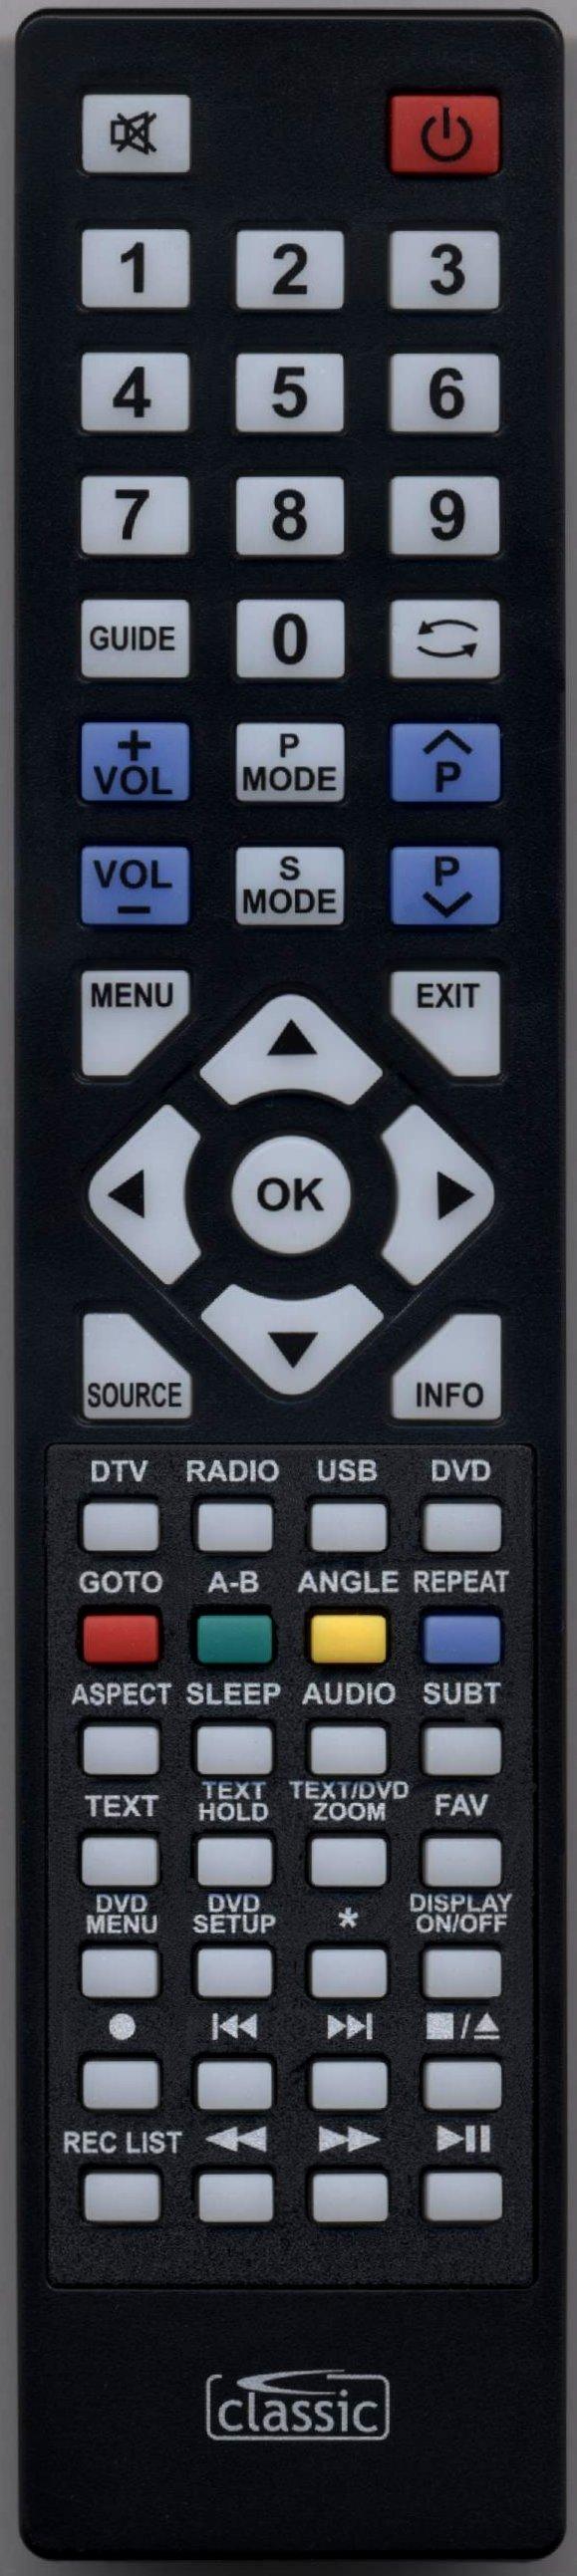 BLAUPUNKT 32-147I-GW-5W-HKUP-UK Remote Control Alternative